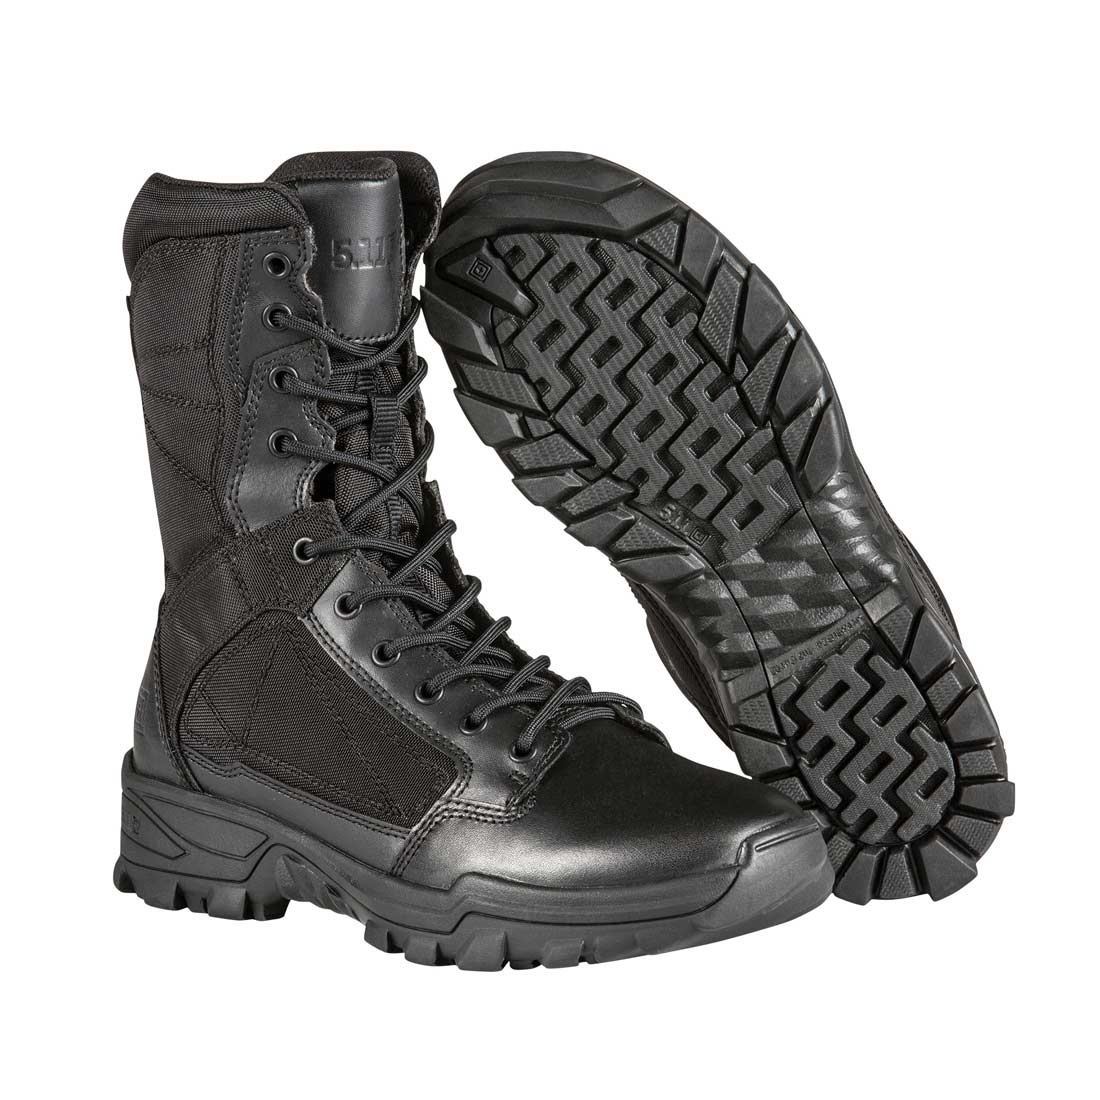 Støvler Taktisk qwXxtY5 Rask Tac8 5 Sko 11 uPTiwOZkX